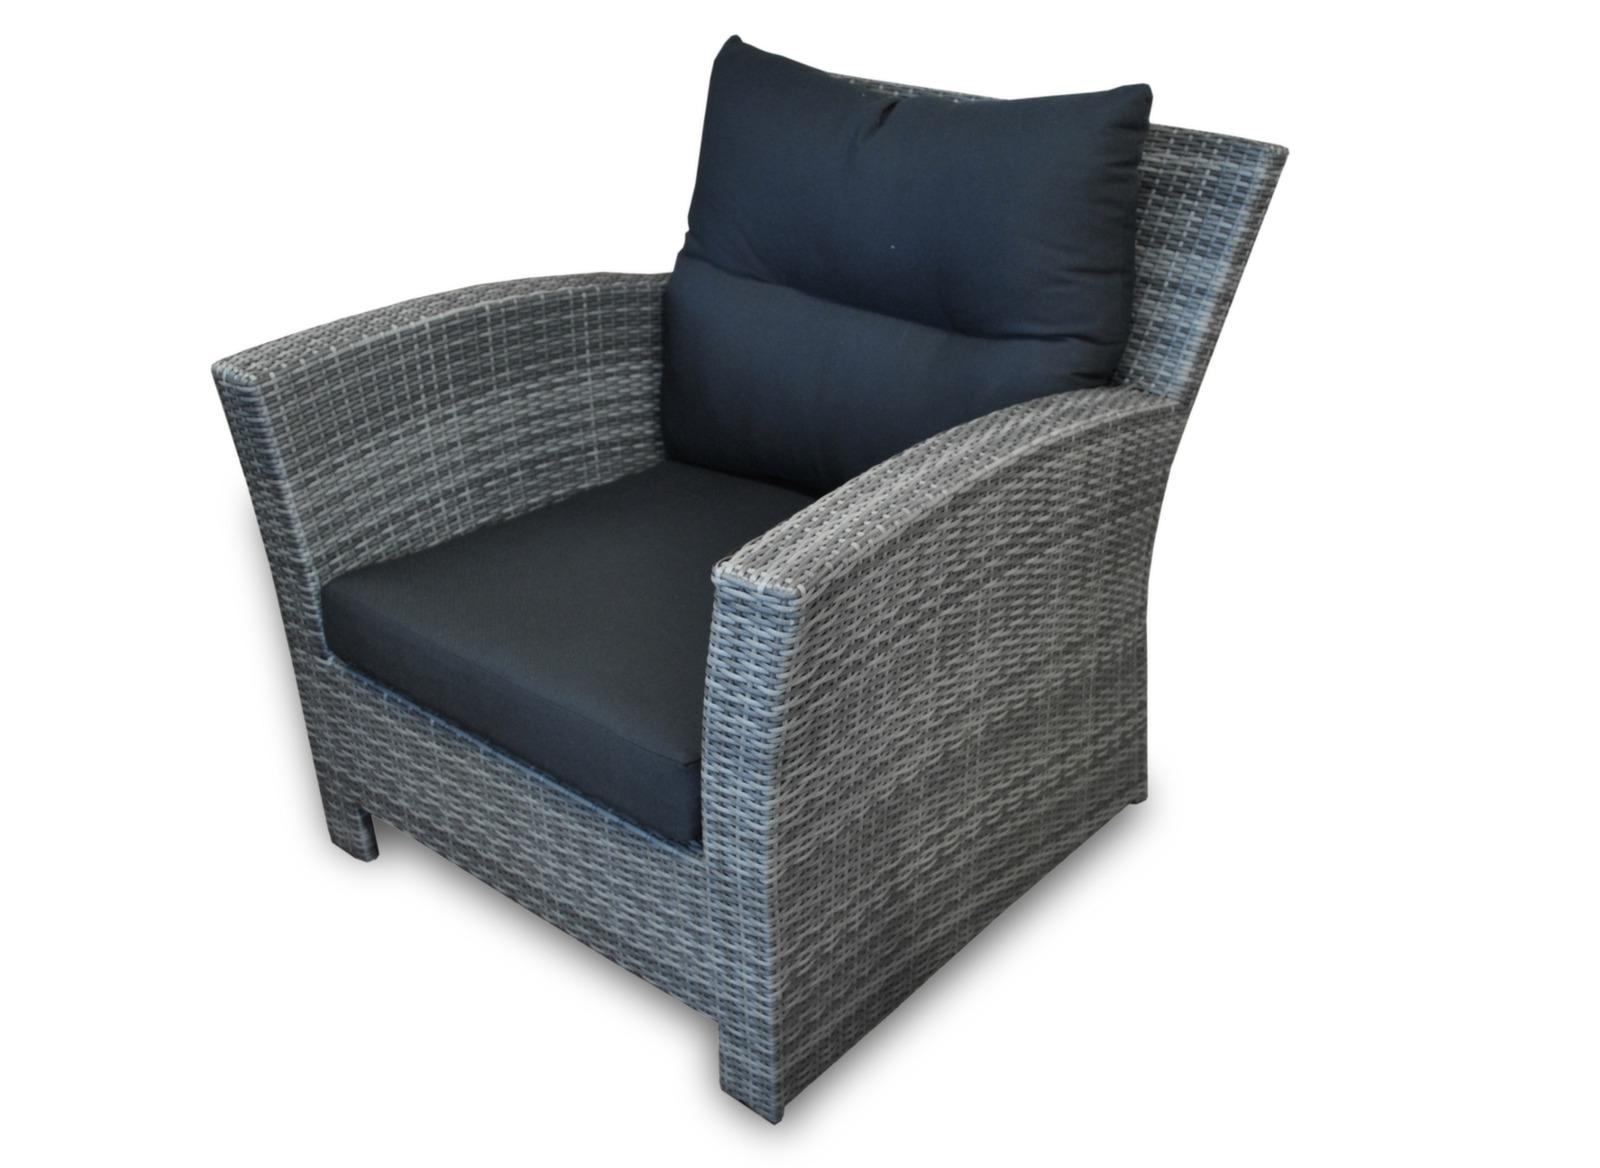 D co mobilier de jardin design alu creteil 12 mobilier nitro canape mobilier de bureau - Mobilier jardin nimes creteil ...